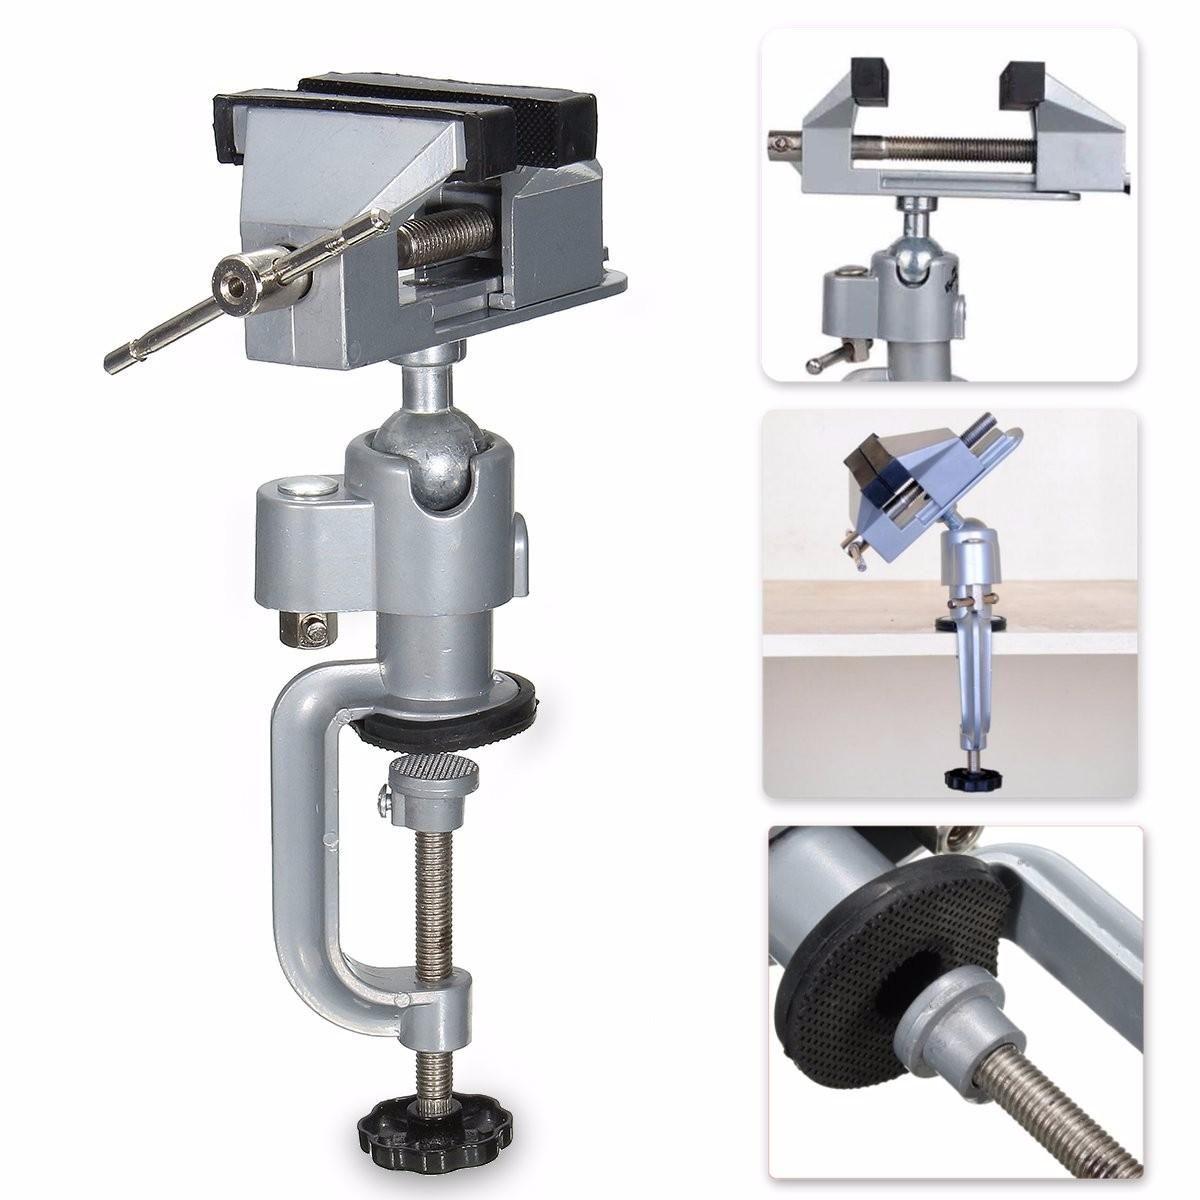 Vise Workbench Swivel 360° Rotating Clamp Table Top Deluxe Craft Repair DIY Tool